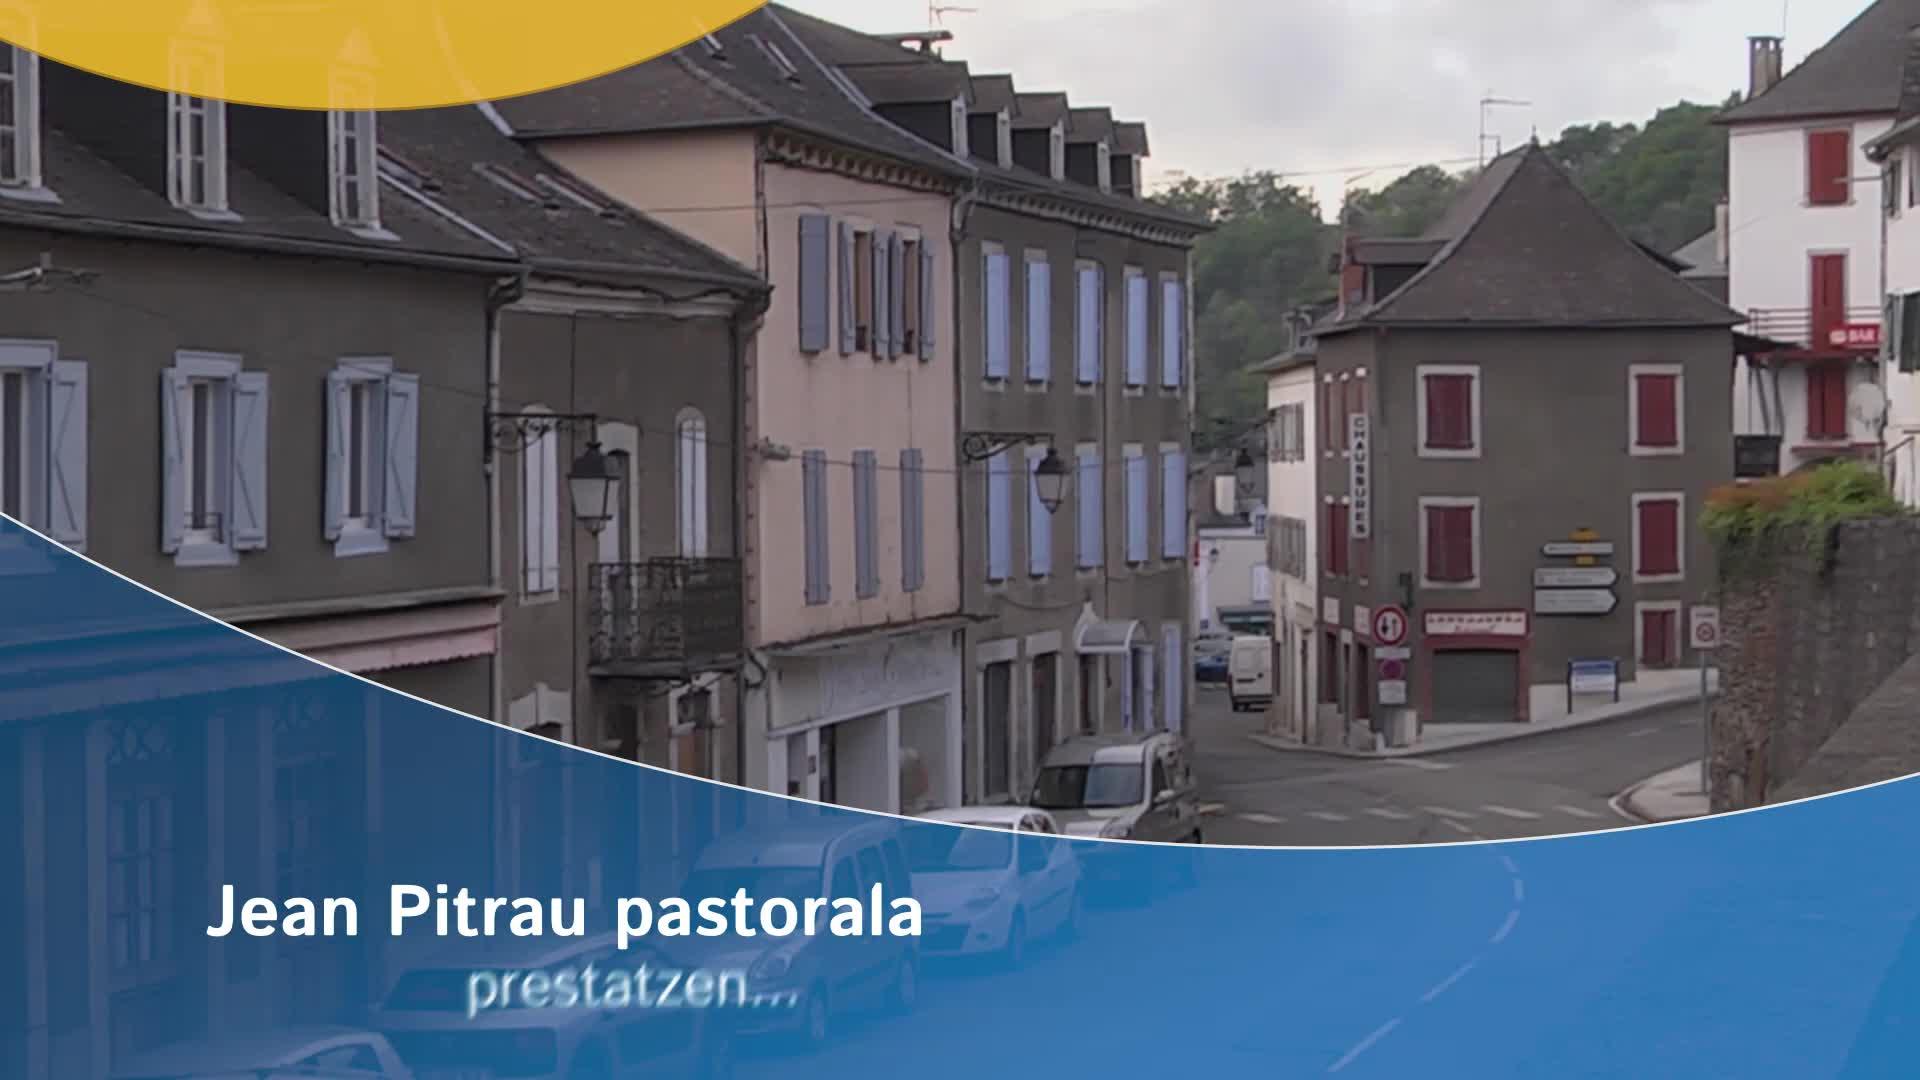 Jean Pitrau pastorala prestatzen